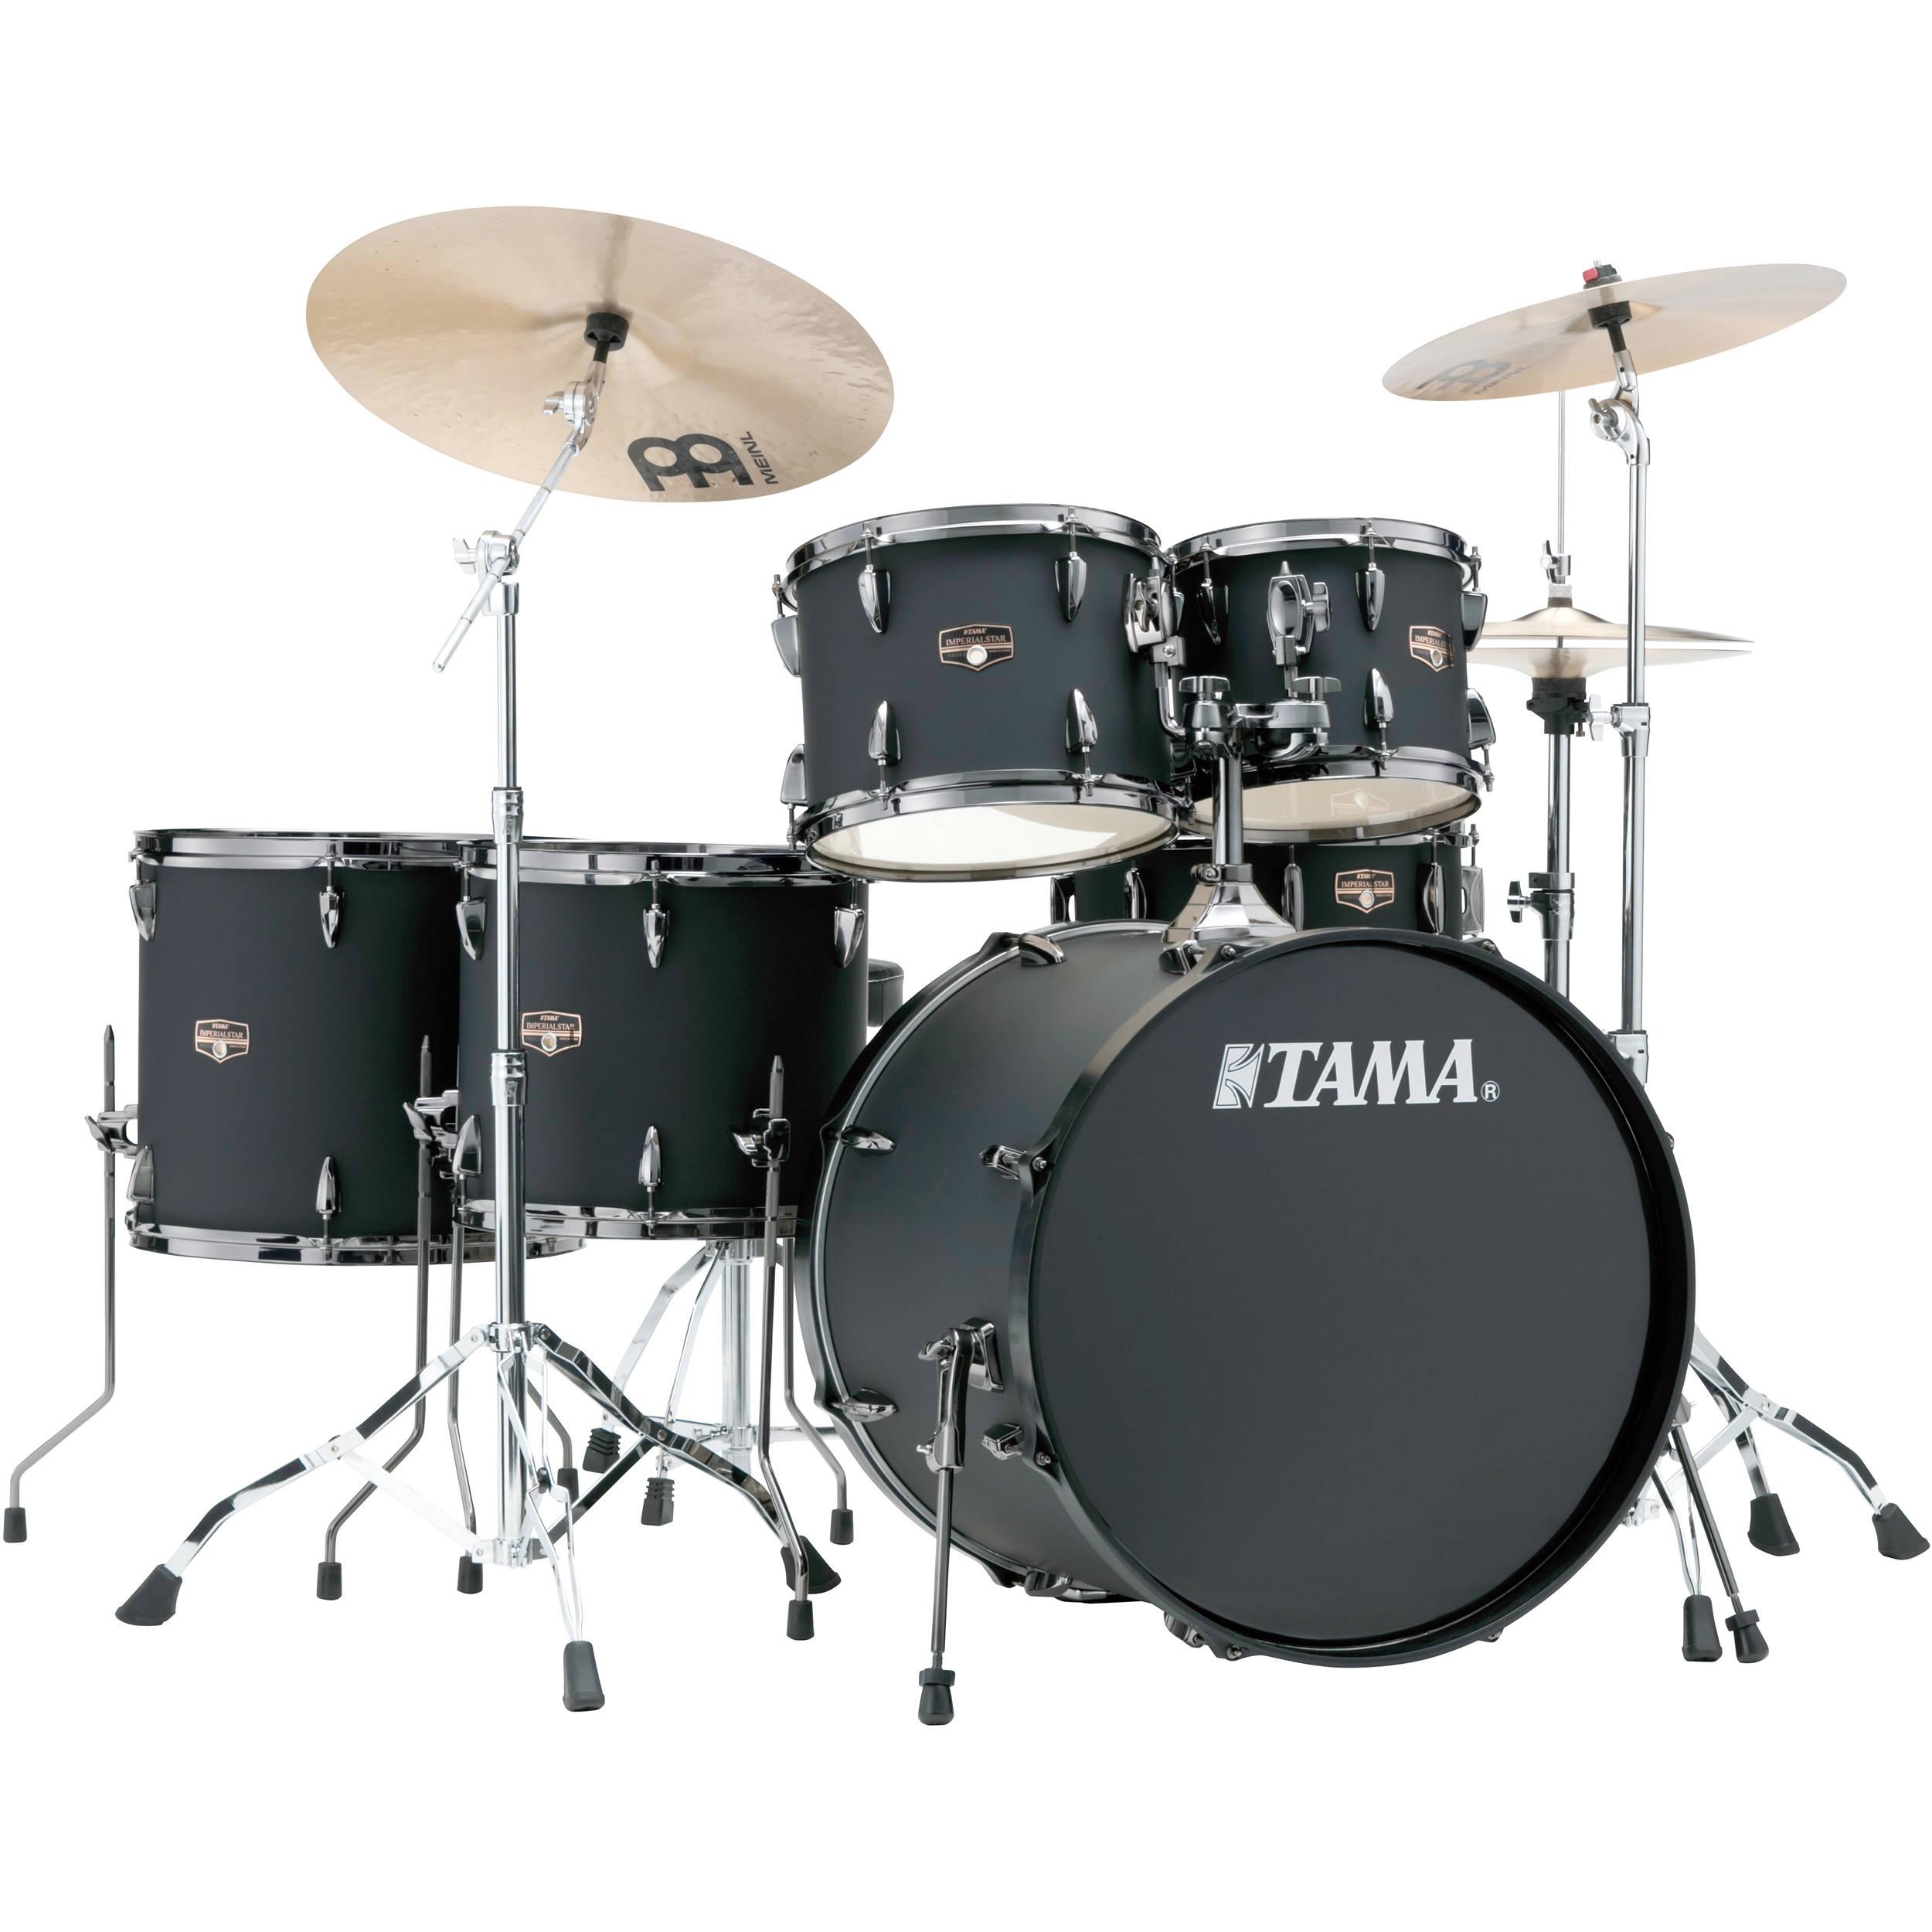 ae73c0876feb TAMA IP62NBCBOB Imperialstar 6-Piece Drum Set with Cymbals (22